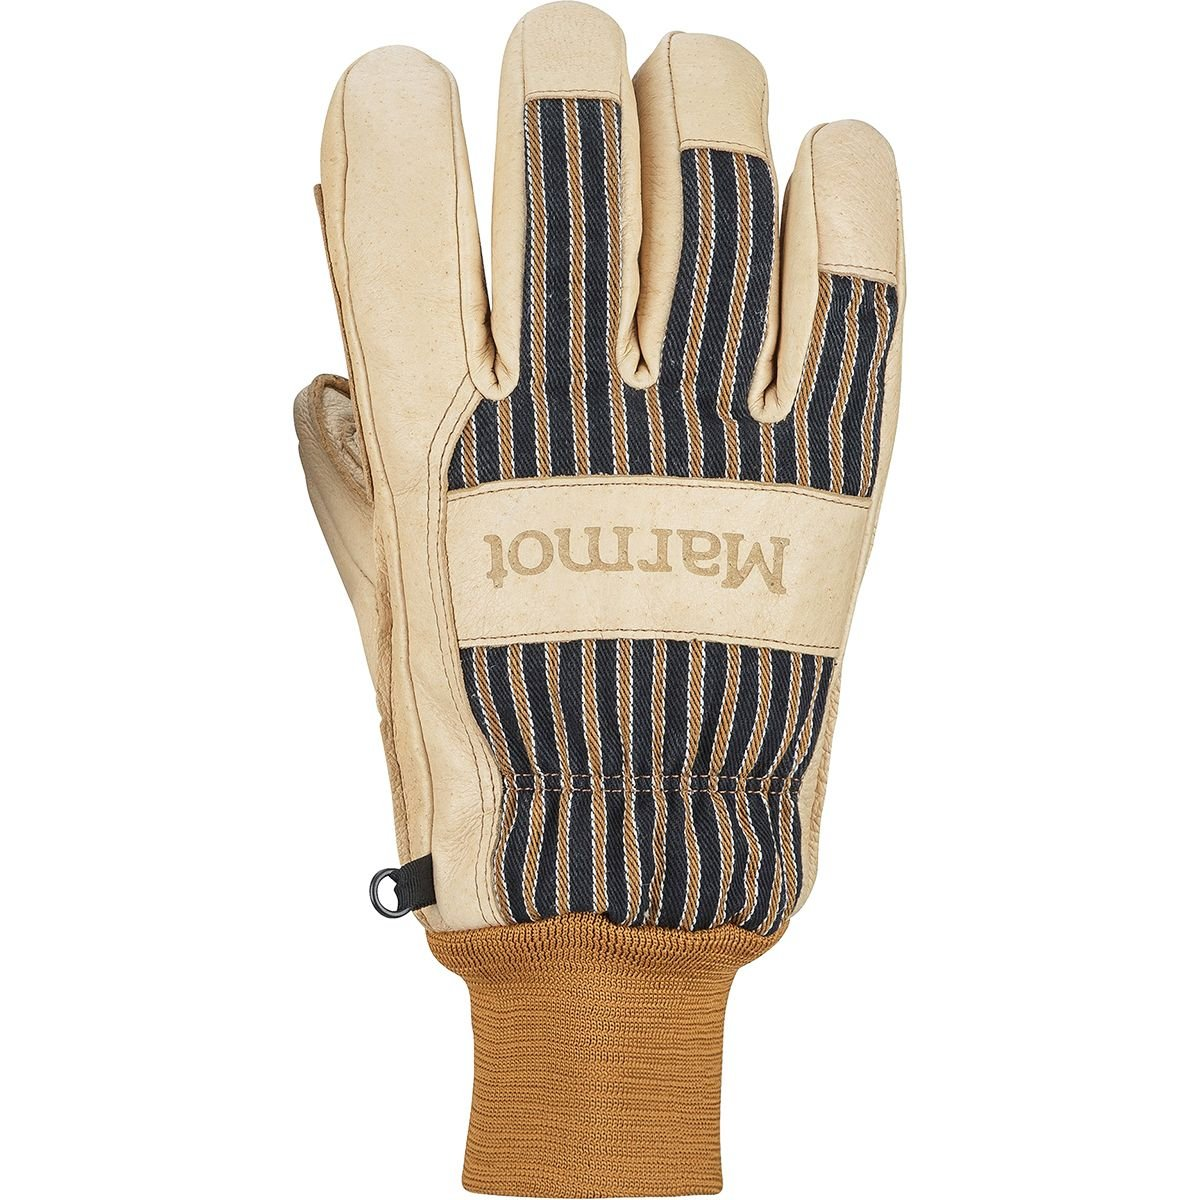 Marmot B07FW2TPQ4 Lifty Glove - - メンズ タン/ブラウン、XL Marmot B07FW2TPQ4, グローバルマーケット:bd7f125a --- ijpba.info